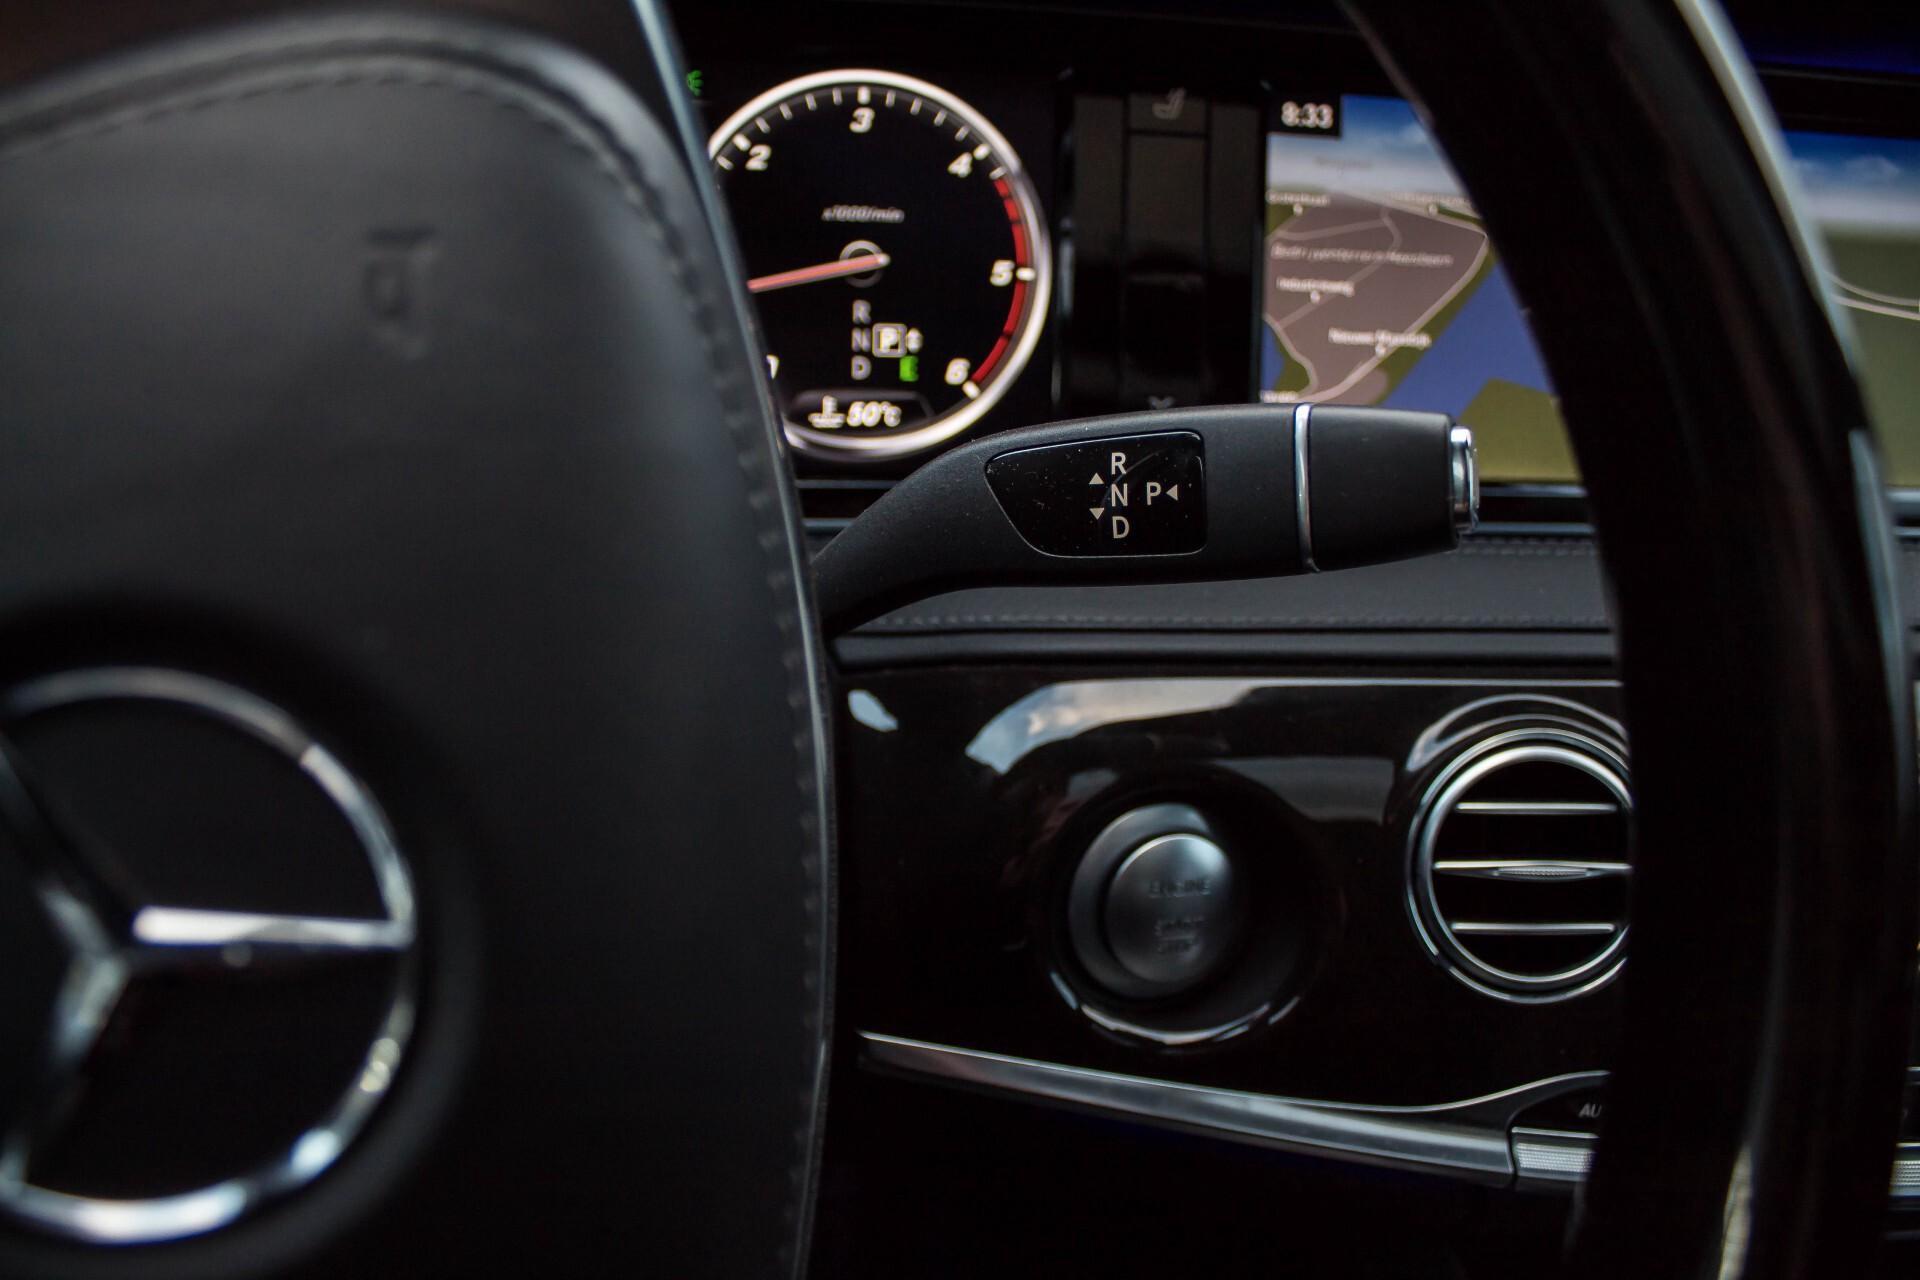 Mercedes-Benz S-Klasse 350 BlueTEC 63 AMG Panorama/Distronic/Keyless/Massage/Burmester Aut7 Foto 18